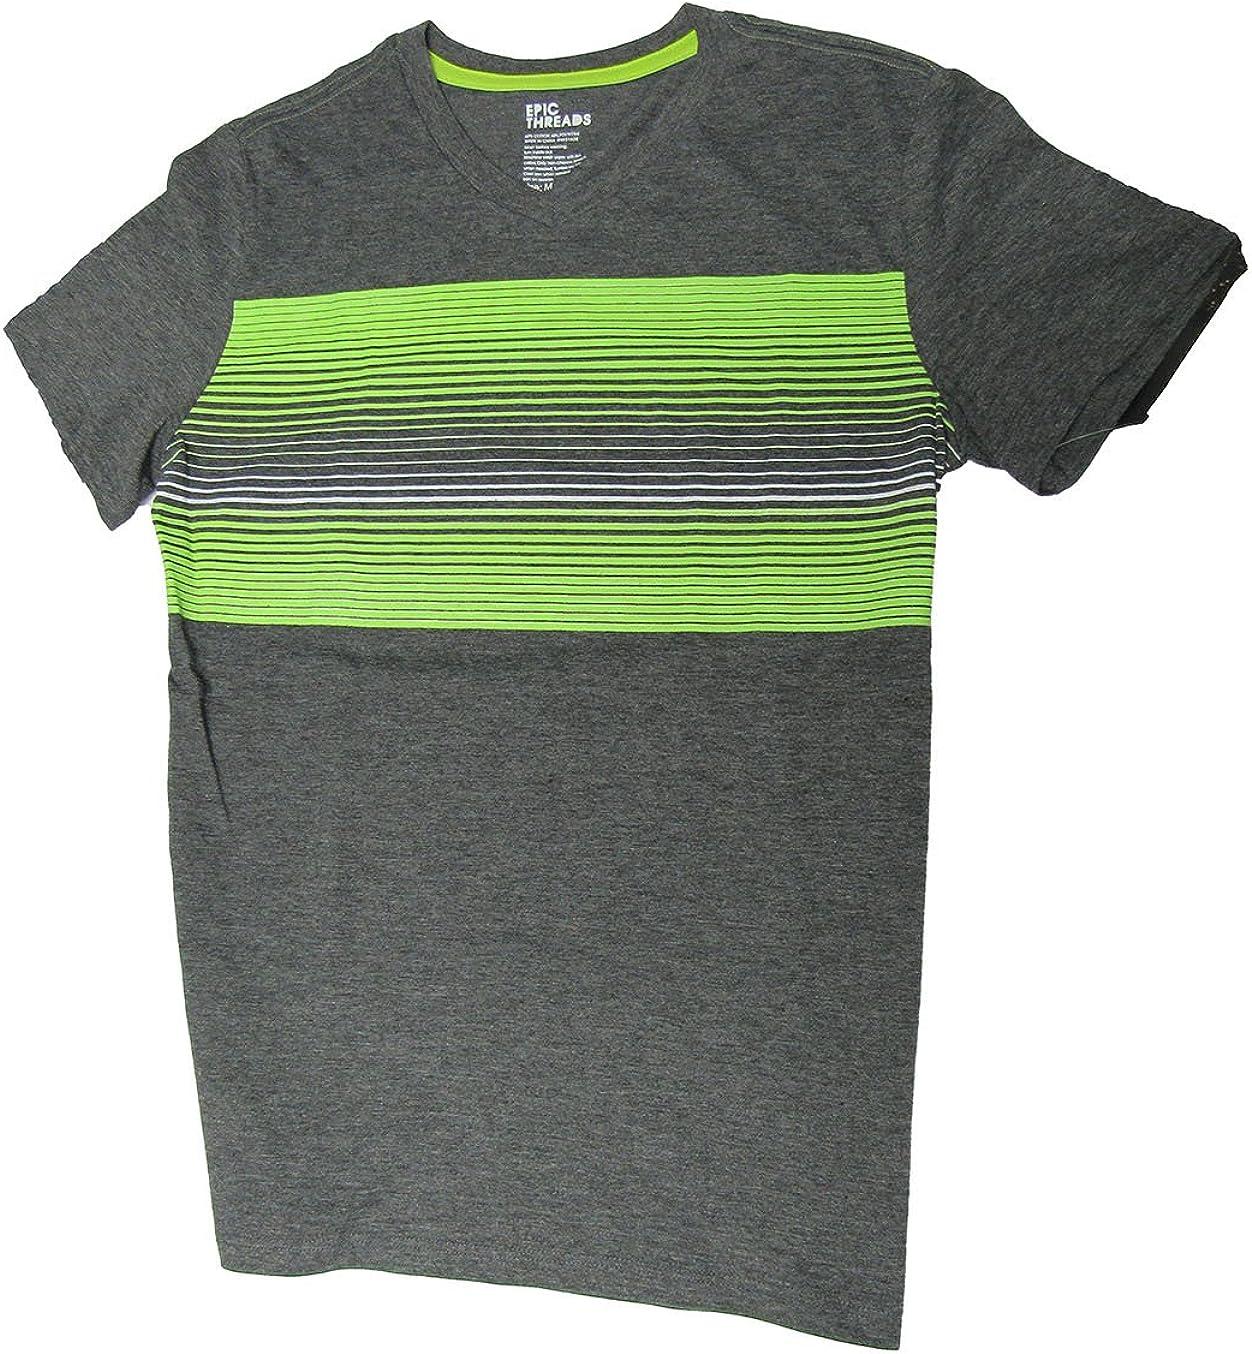 Epic Threads Boys' Milos Stripe T-Shirt Charcoal Heather Medium